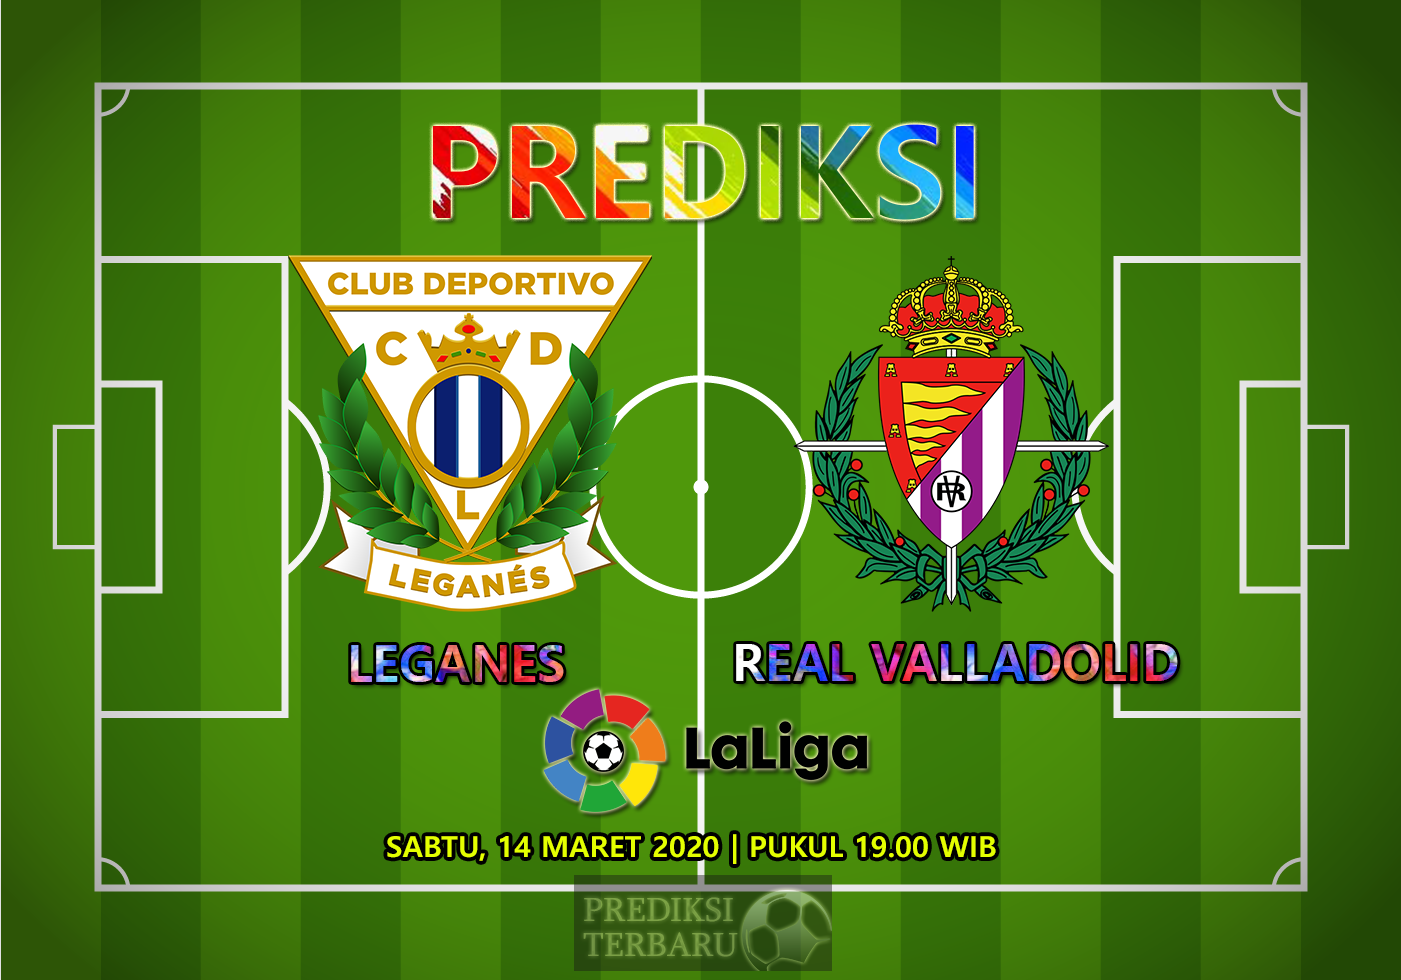 Prediksi Leganes Vs Real Valladolid Sabtu 14 Maret